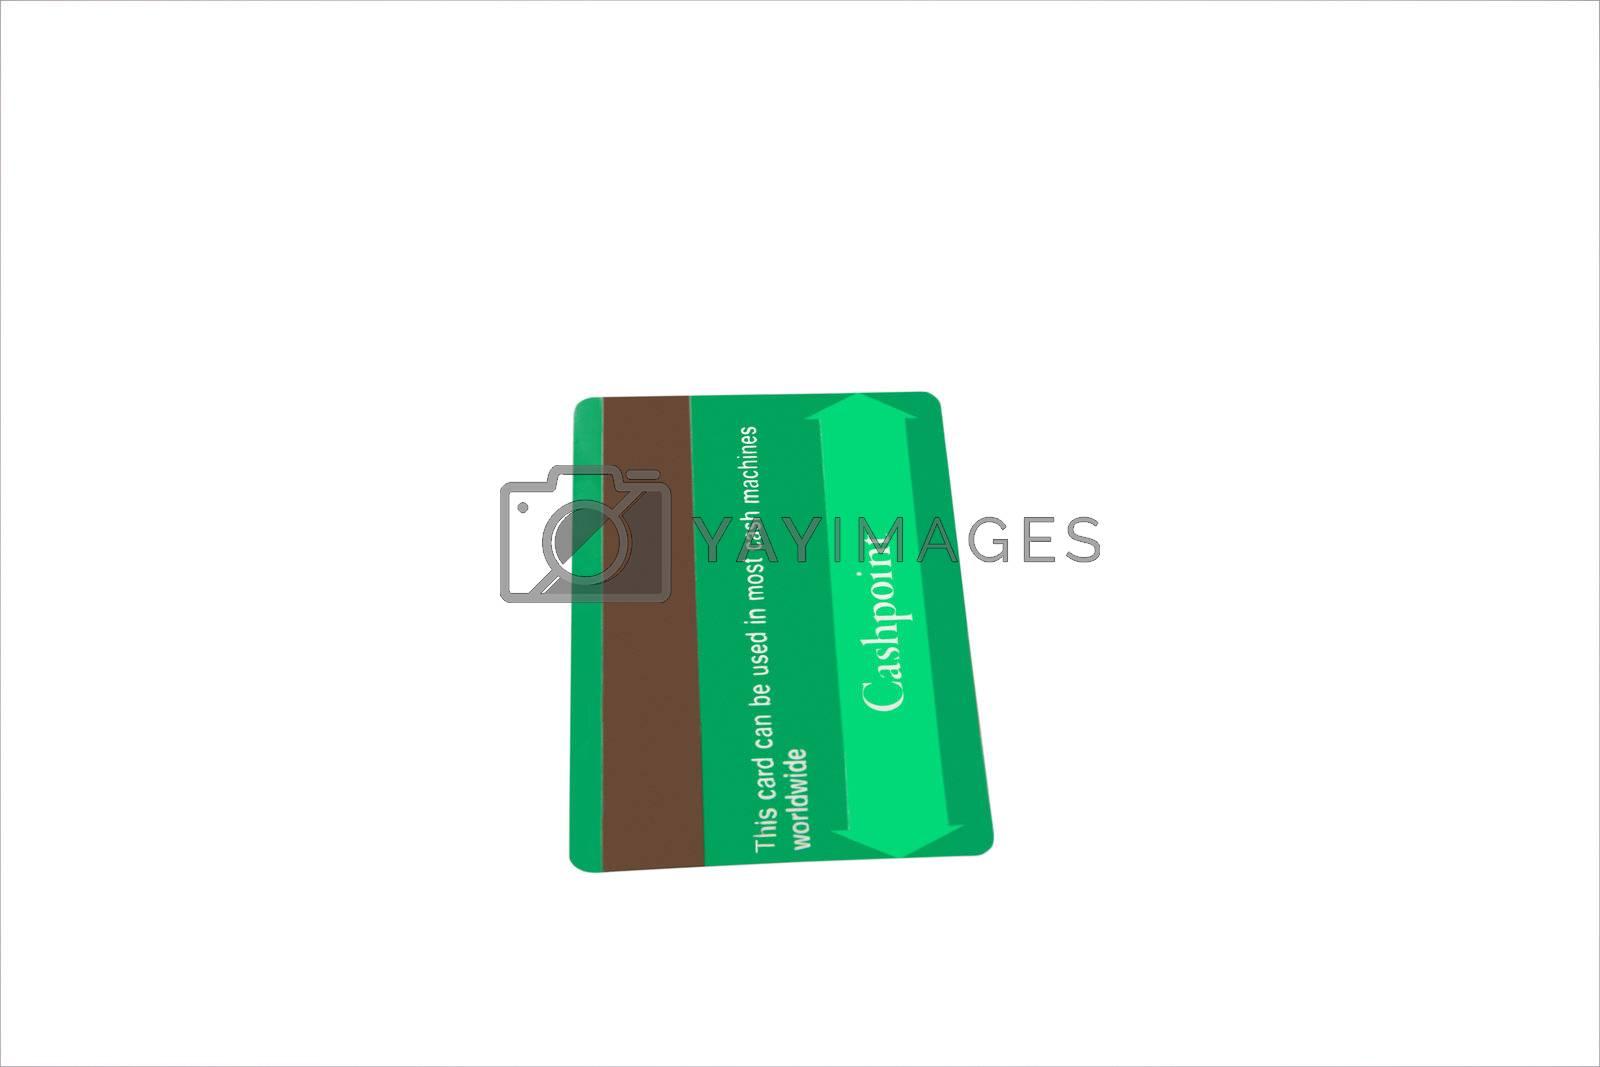 a matt green plain credit card with clipping path